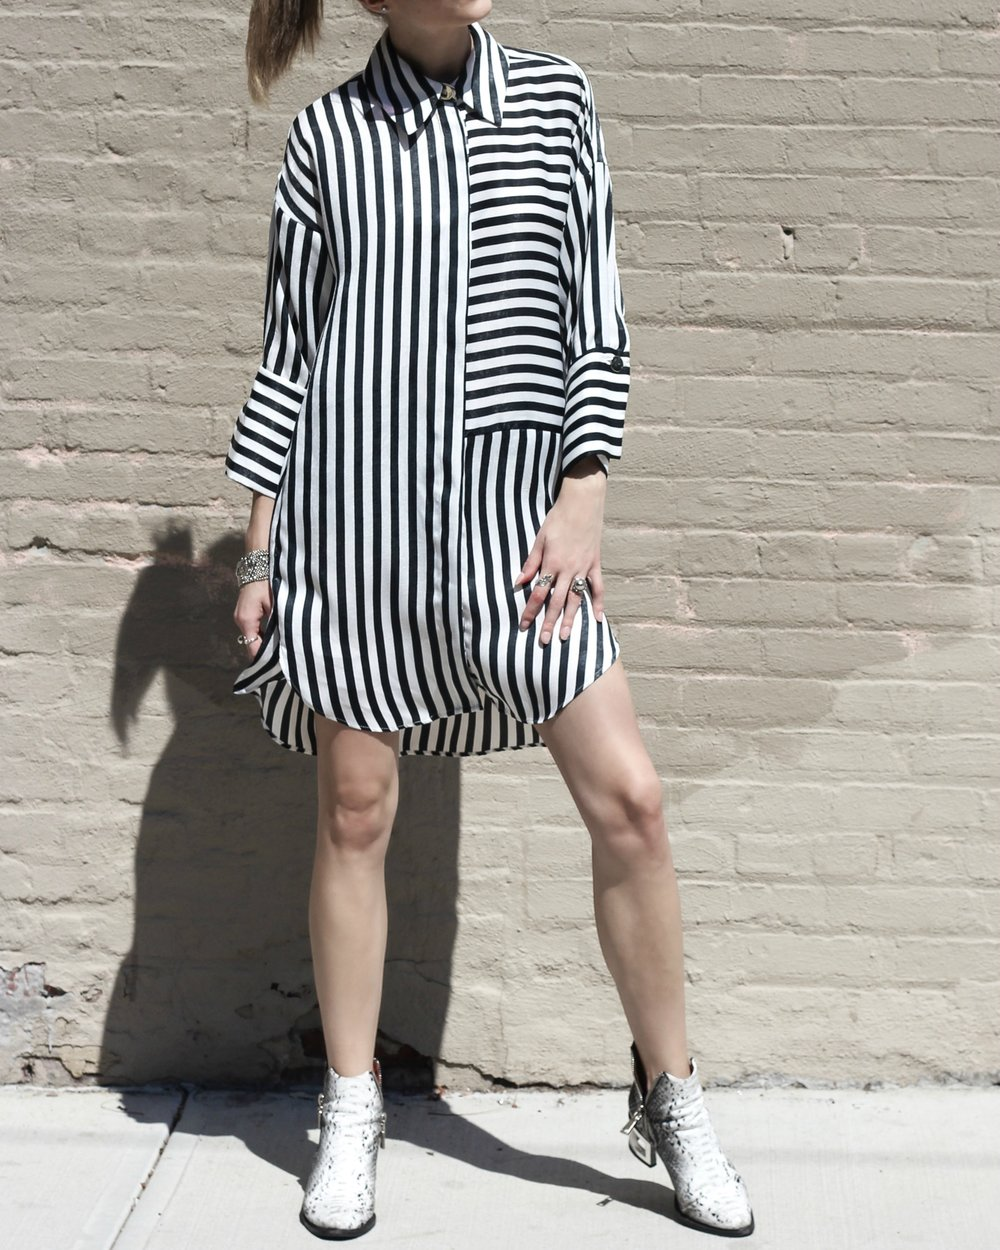 Directional Stripes-4.jpg